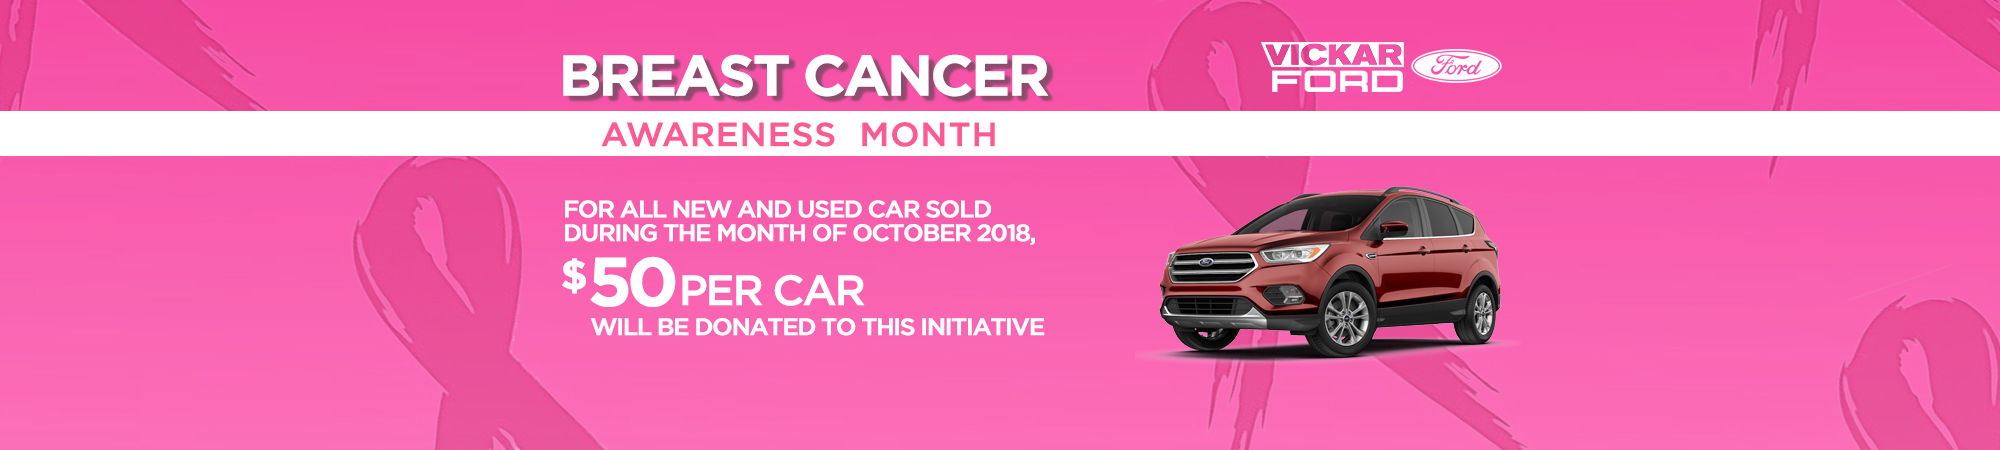 Vickar Ford Breast Awareness